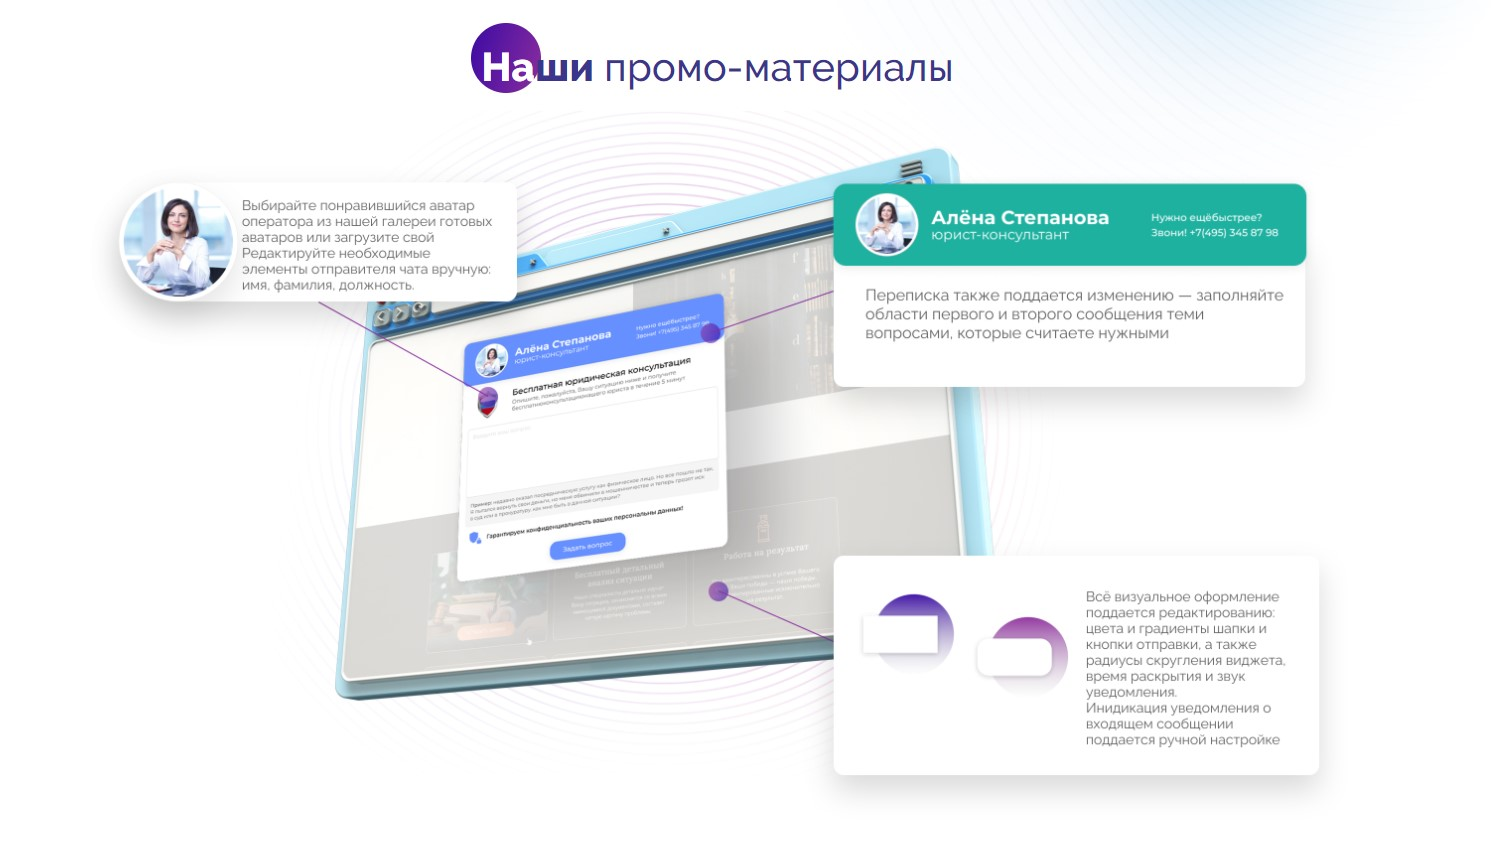 Партнерская программа Onnet - White Label с виджетами